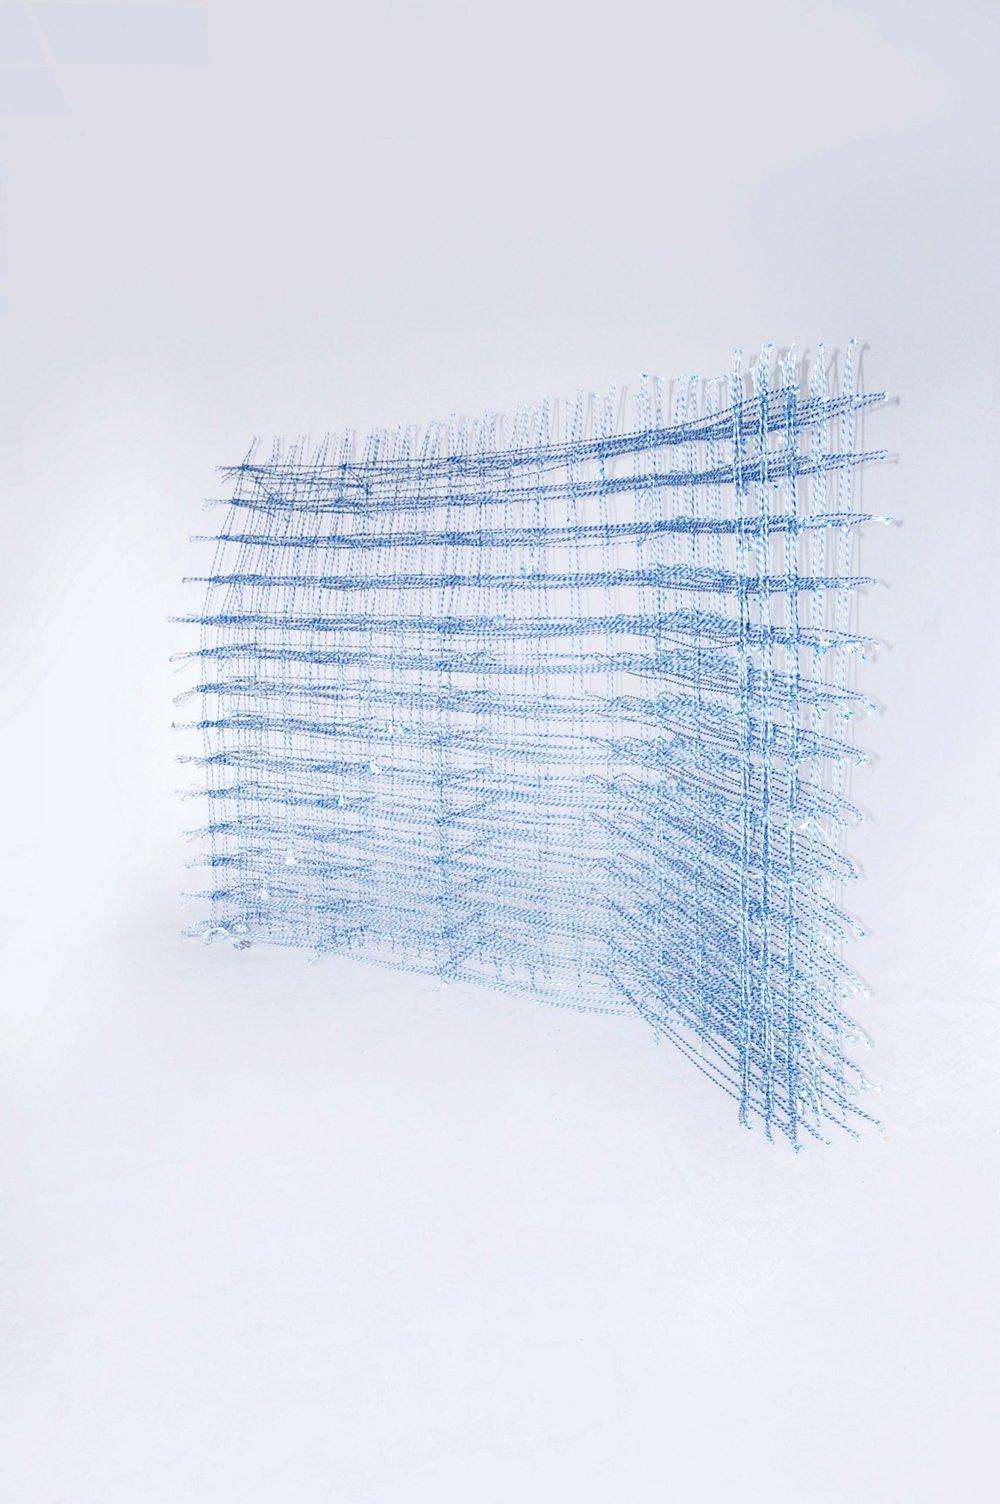 standing-textiles-fransje-gimbrere-dutch-design-week-design-academy-eindhoven_dezeen_2364_col_10-1704x2562.jpg